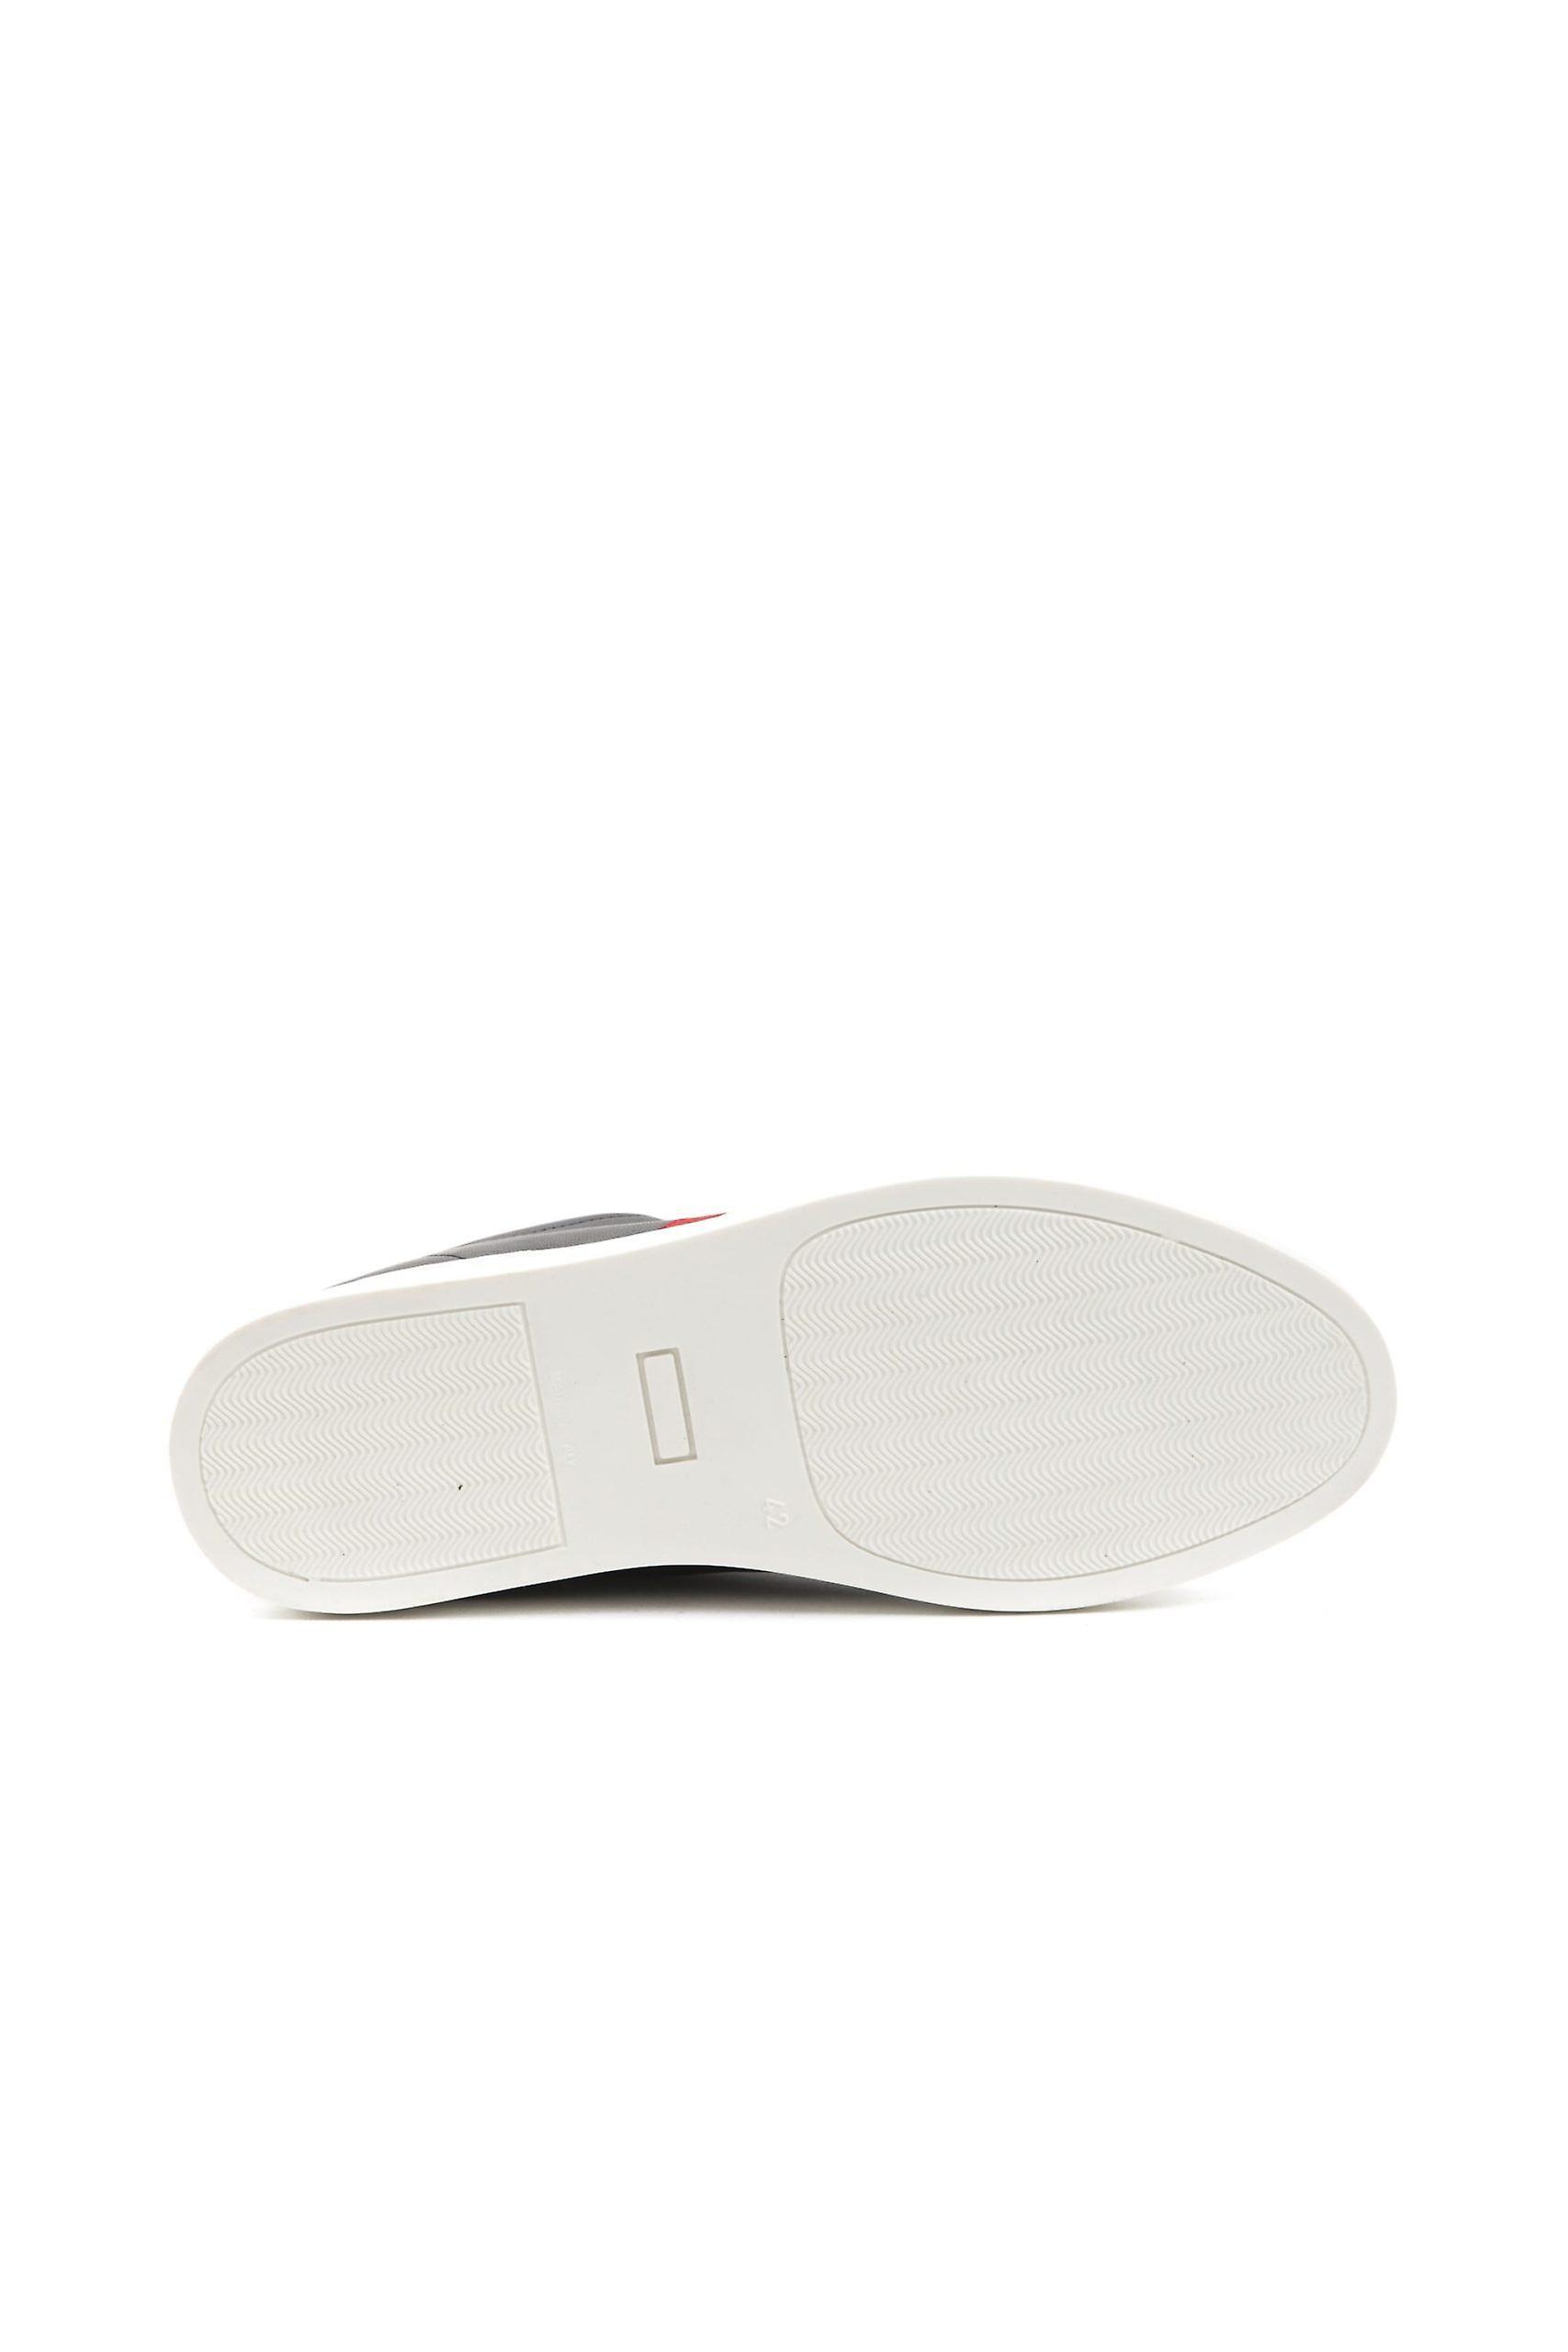 Castelbajac Nero- Bia- Ros Sneakers